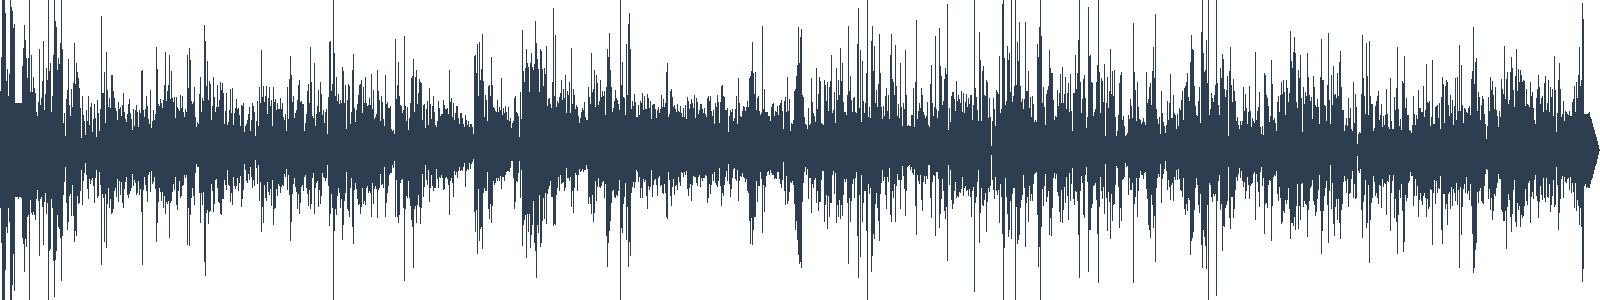 Speciál - Co posloucháme #35 waveform